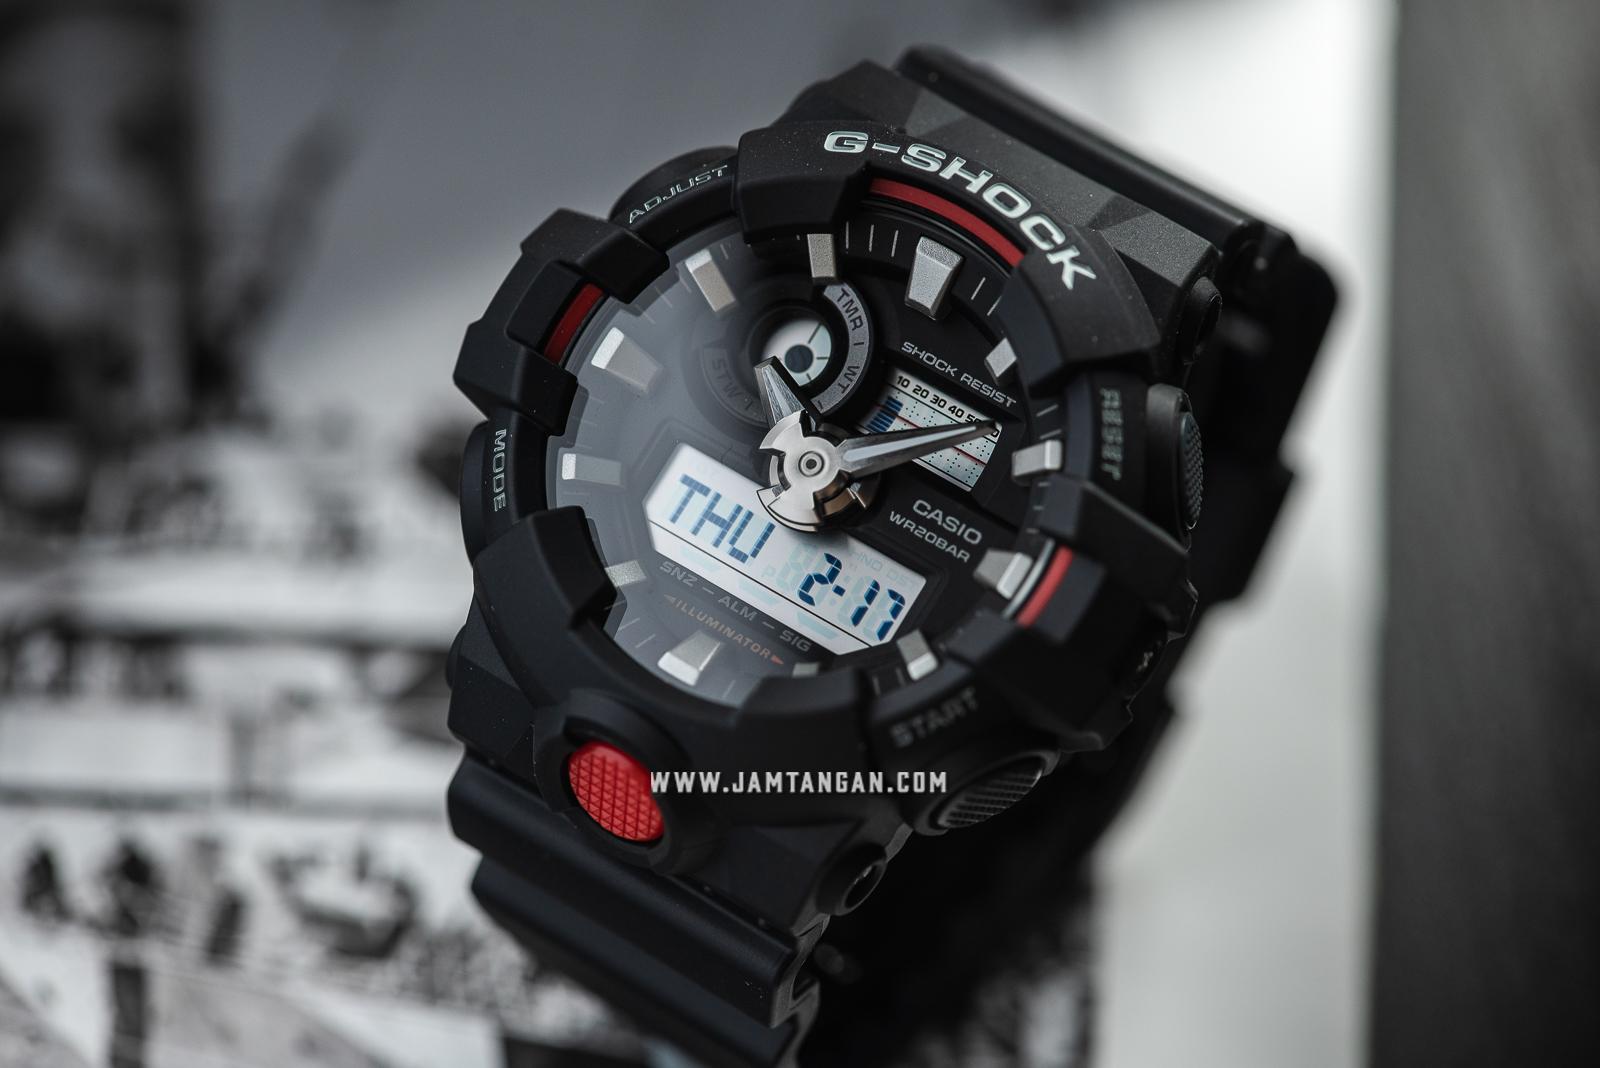 Casio G-Shock GA-700-1ADR Water Resistant 200M Resin Band Machtwatch